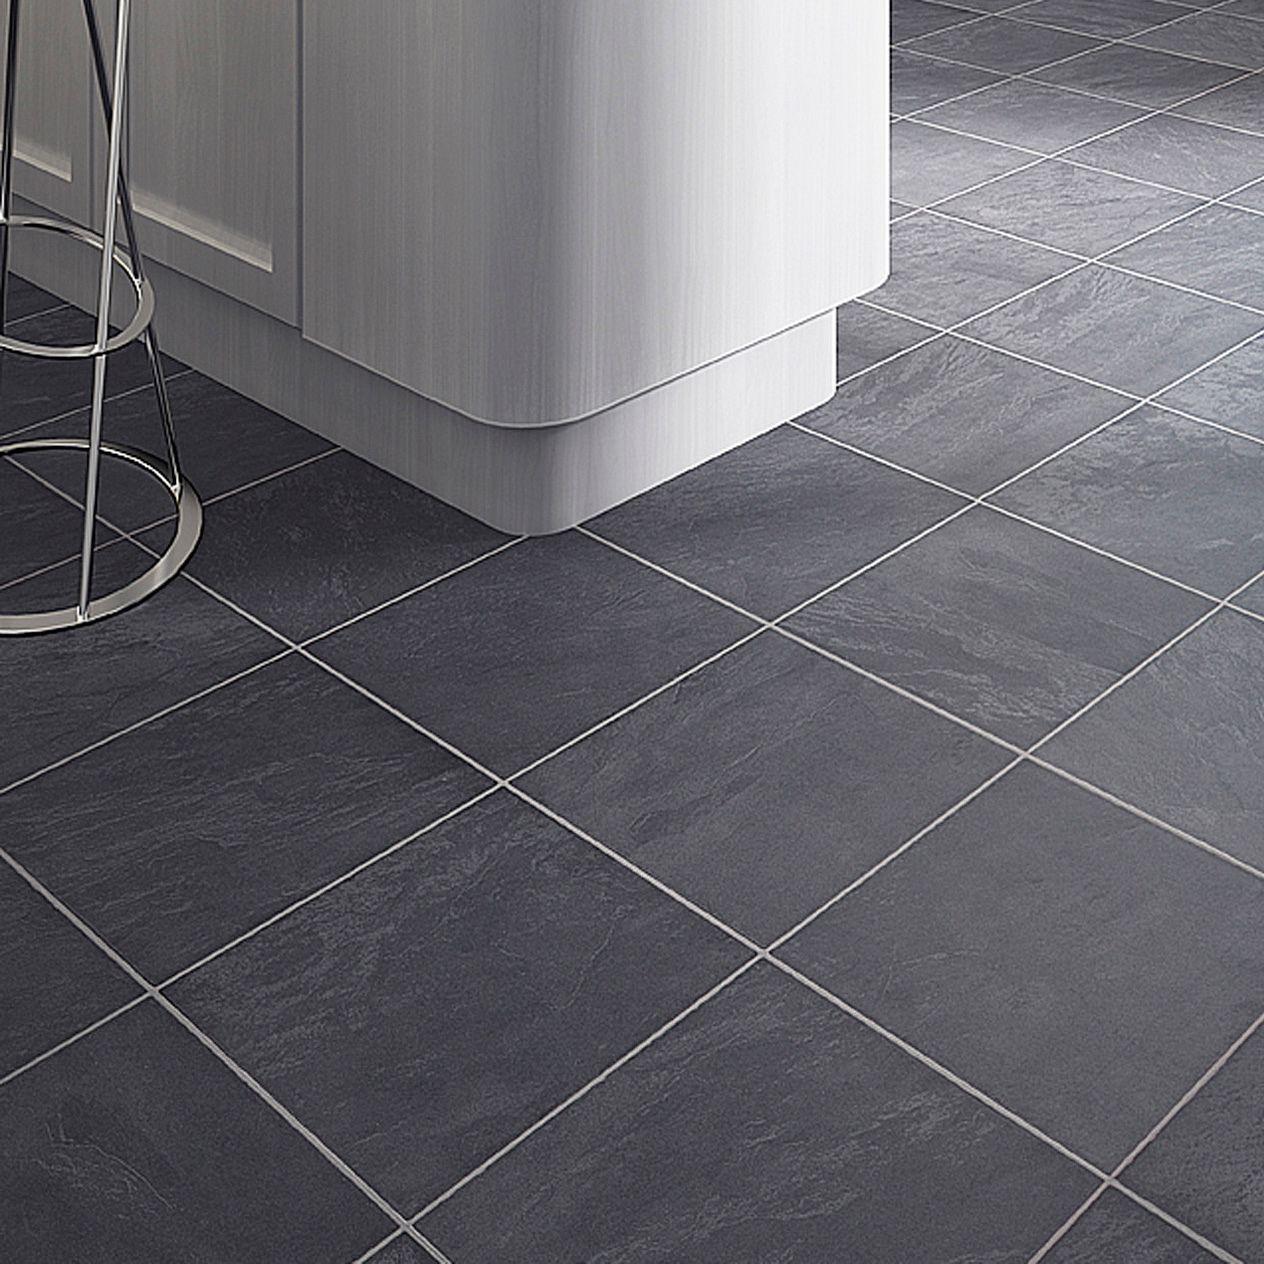 laminate kitchen flooring Colours Leggiero Blue Slate Tile Effect Laminate Flooring 1 72m Pack Rooms DIY at